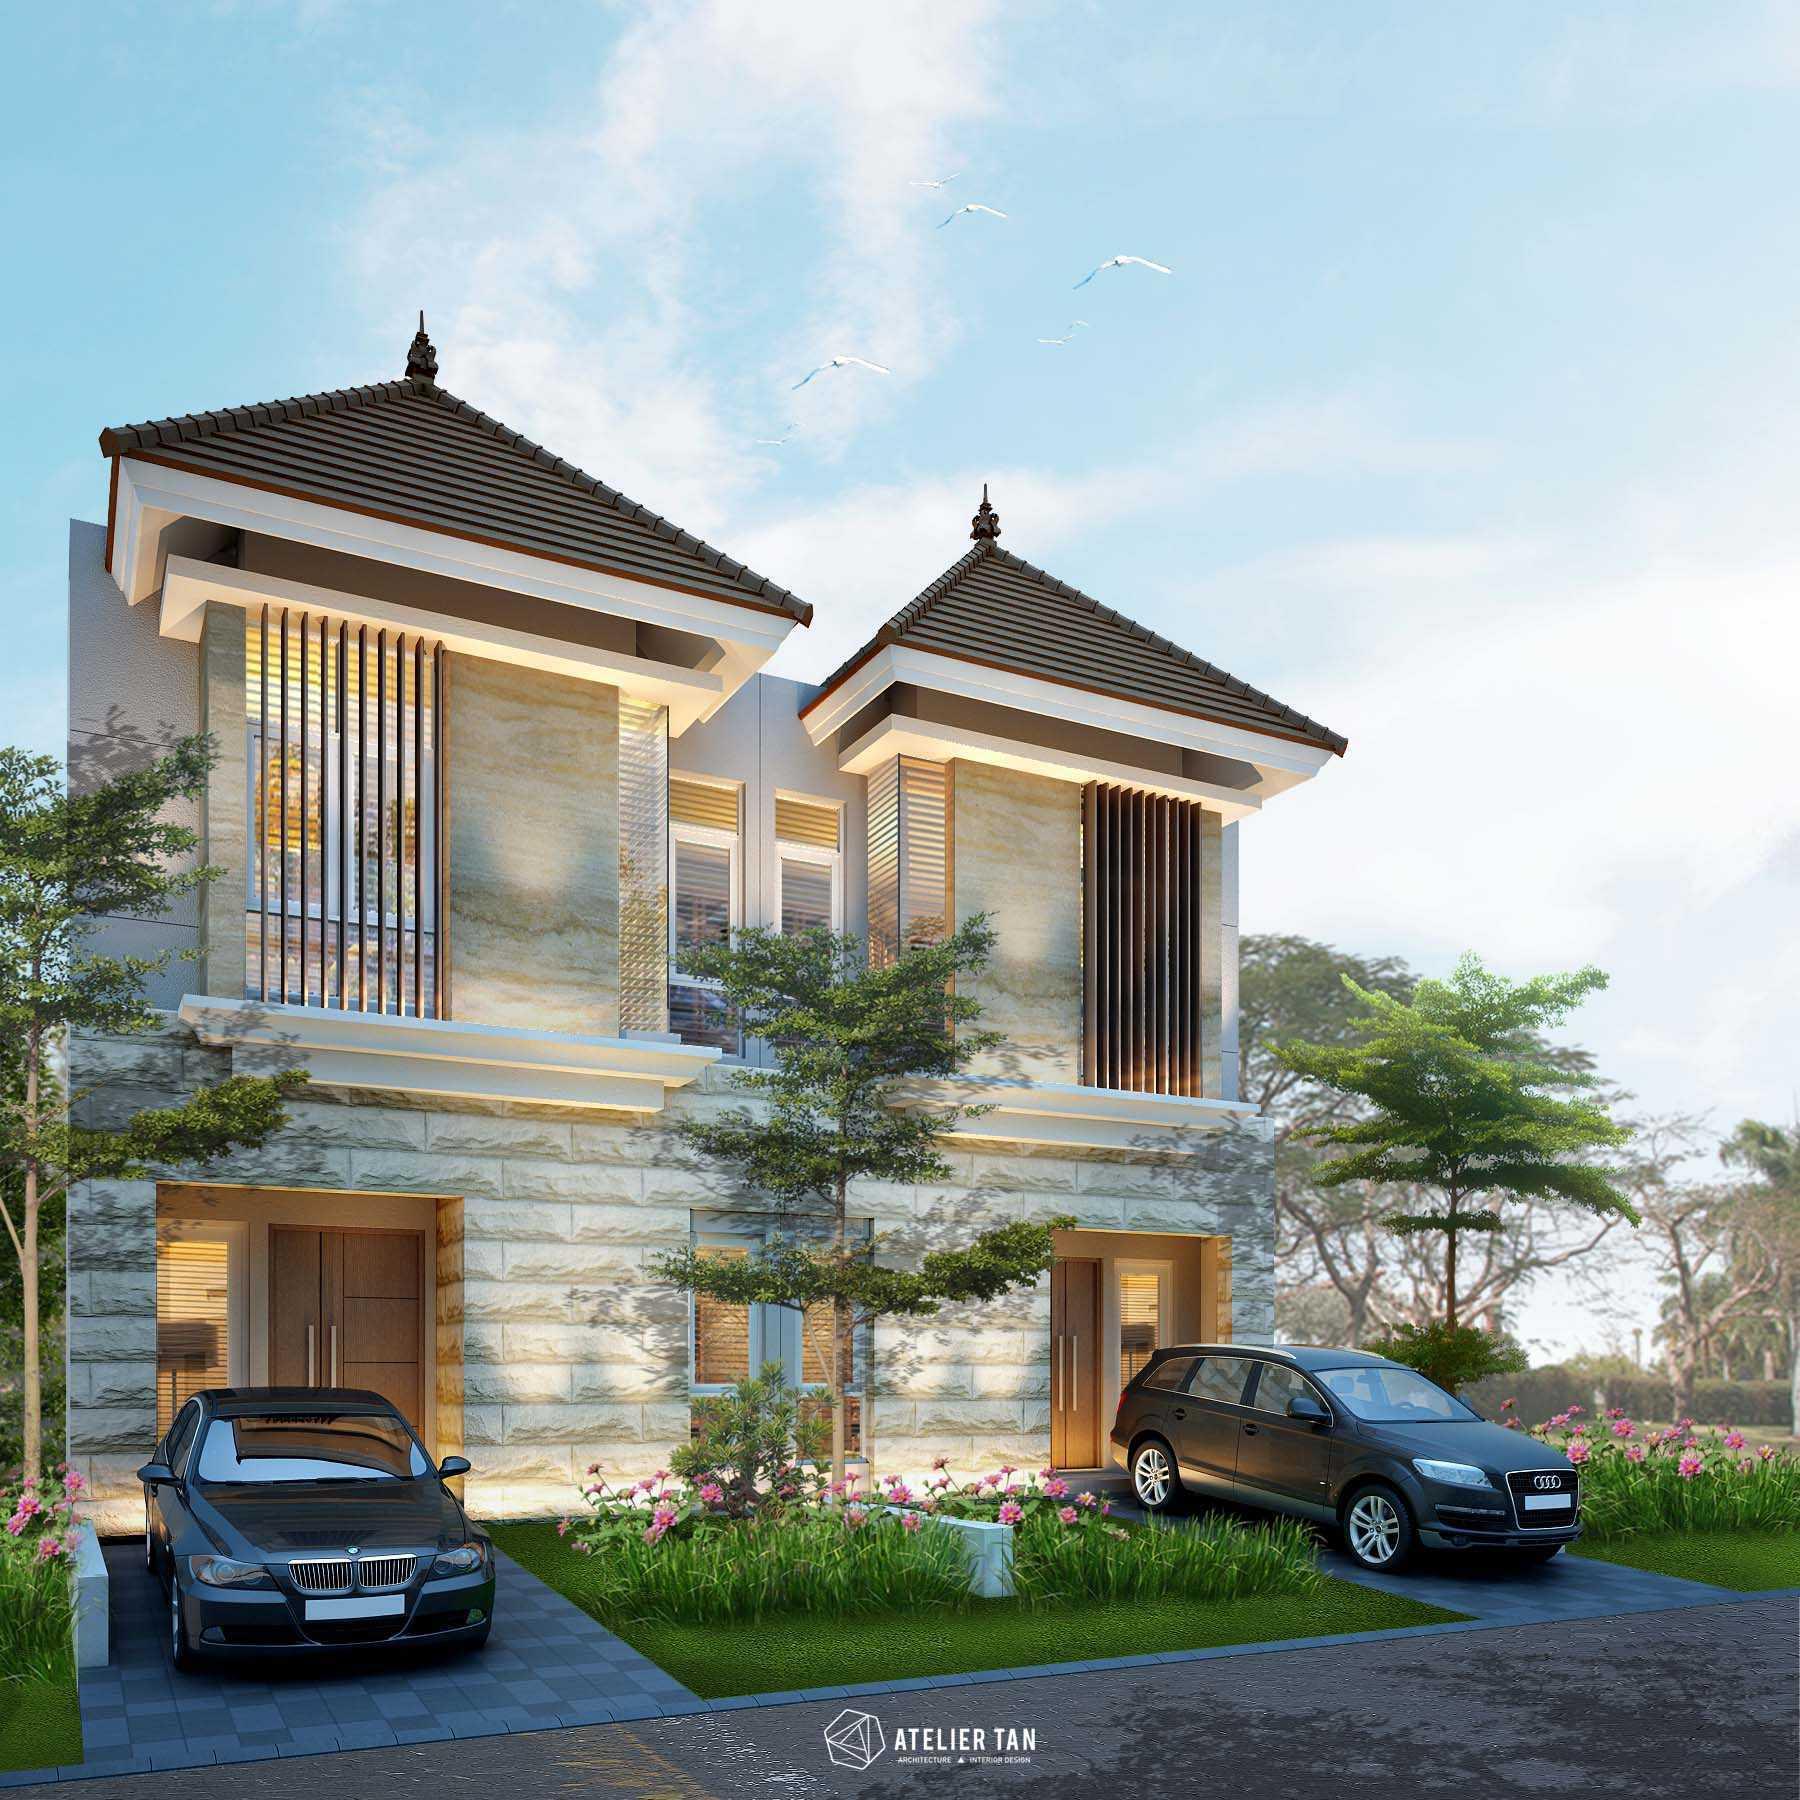 Ateliertan New Springville Bekasi Bekasi New-Springville-C   44789